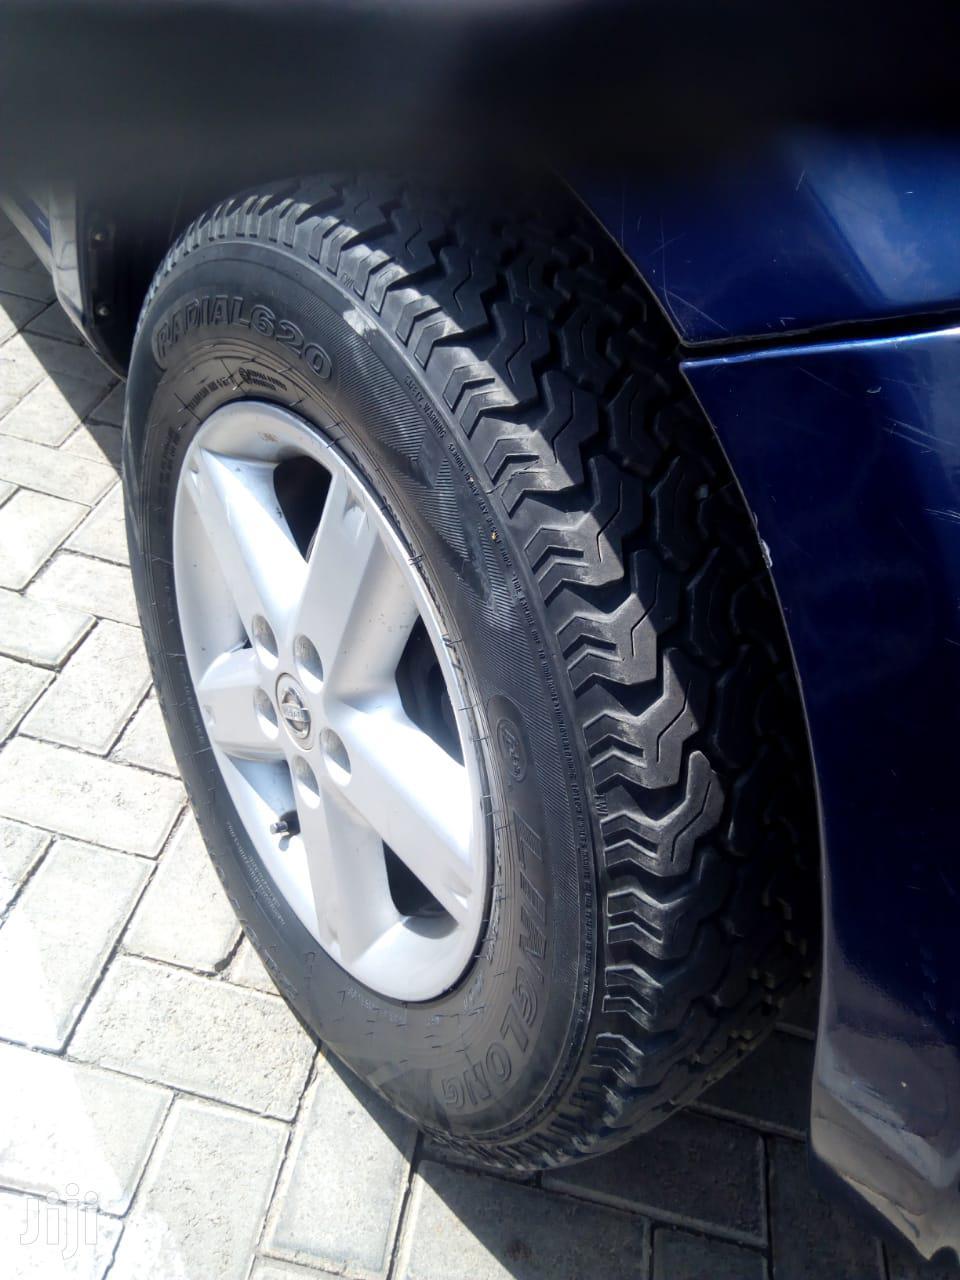 Nissan X-Trail 2005 Blue | Cars for sale in Nairobi Central, Nairobi, Kenya